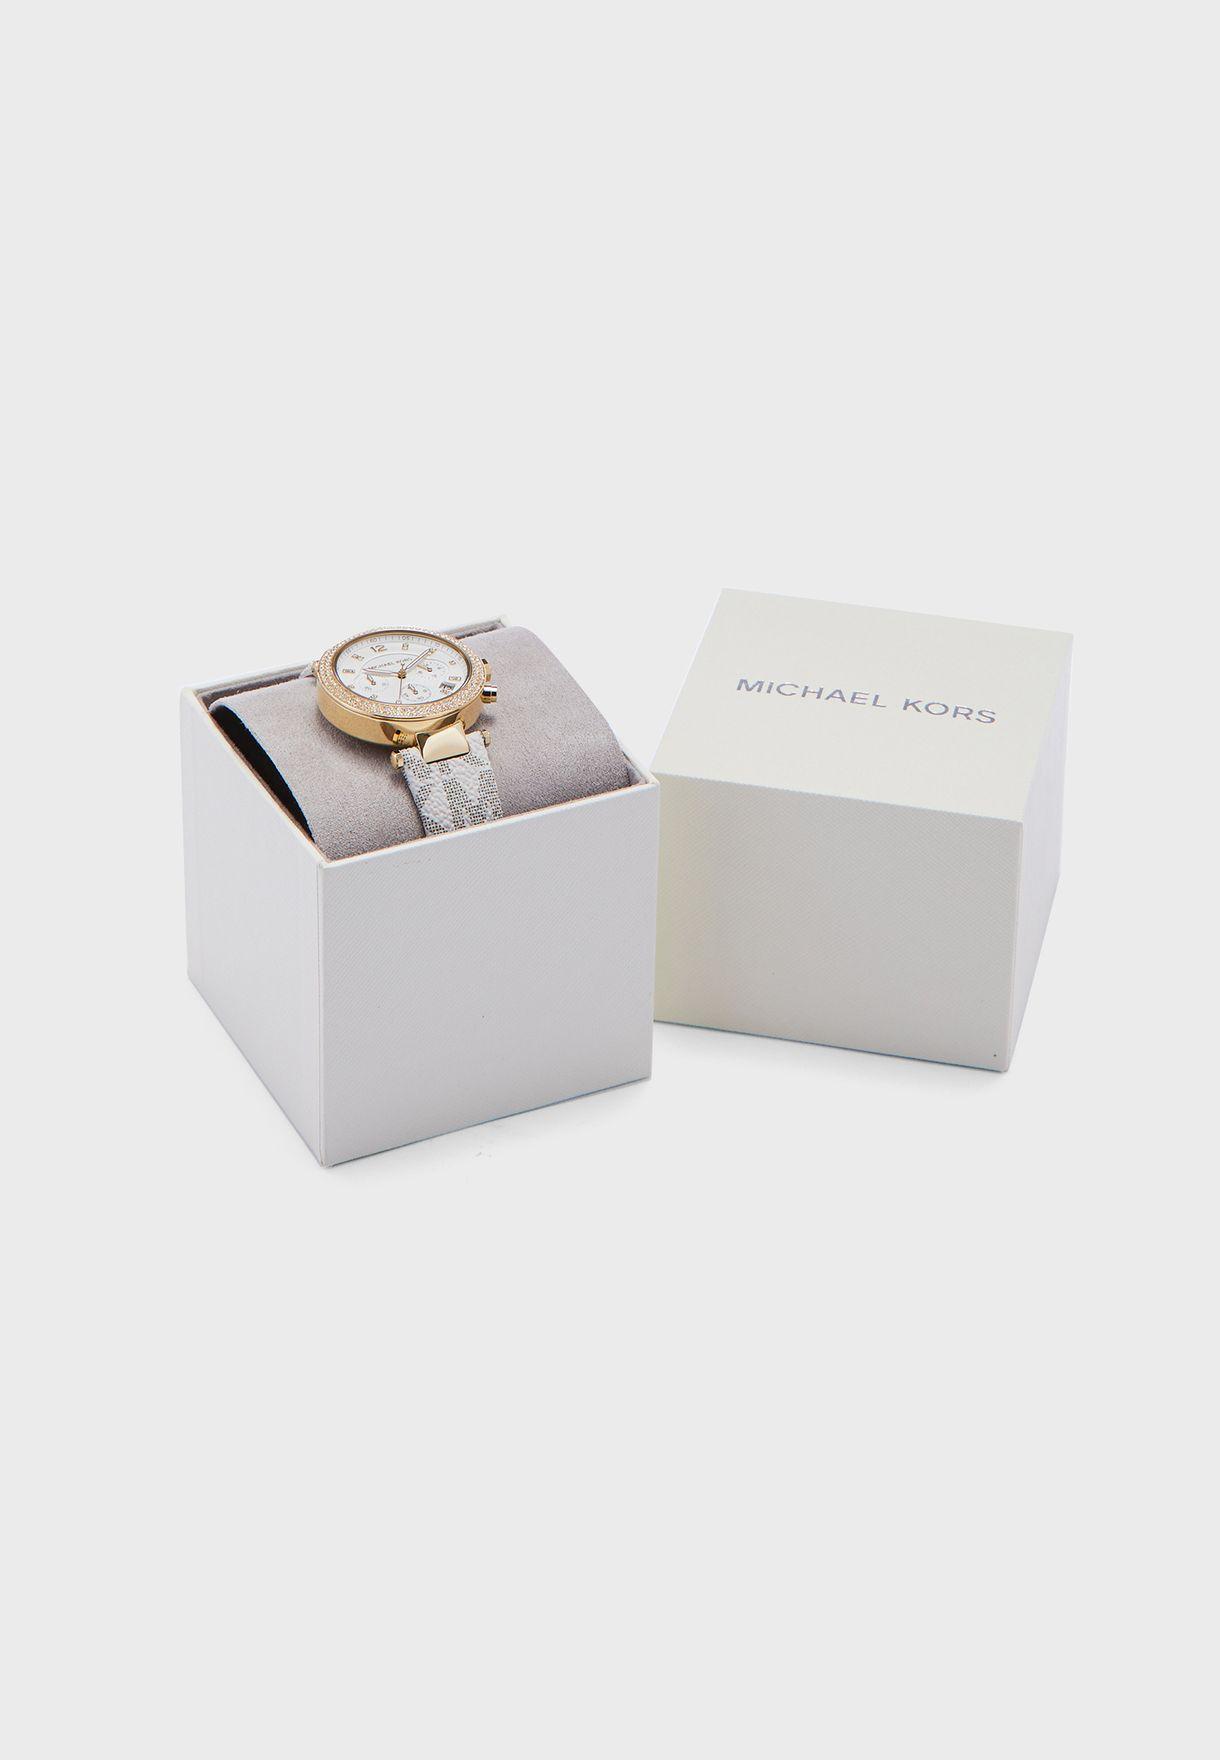 MK6916 Analog Watch